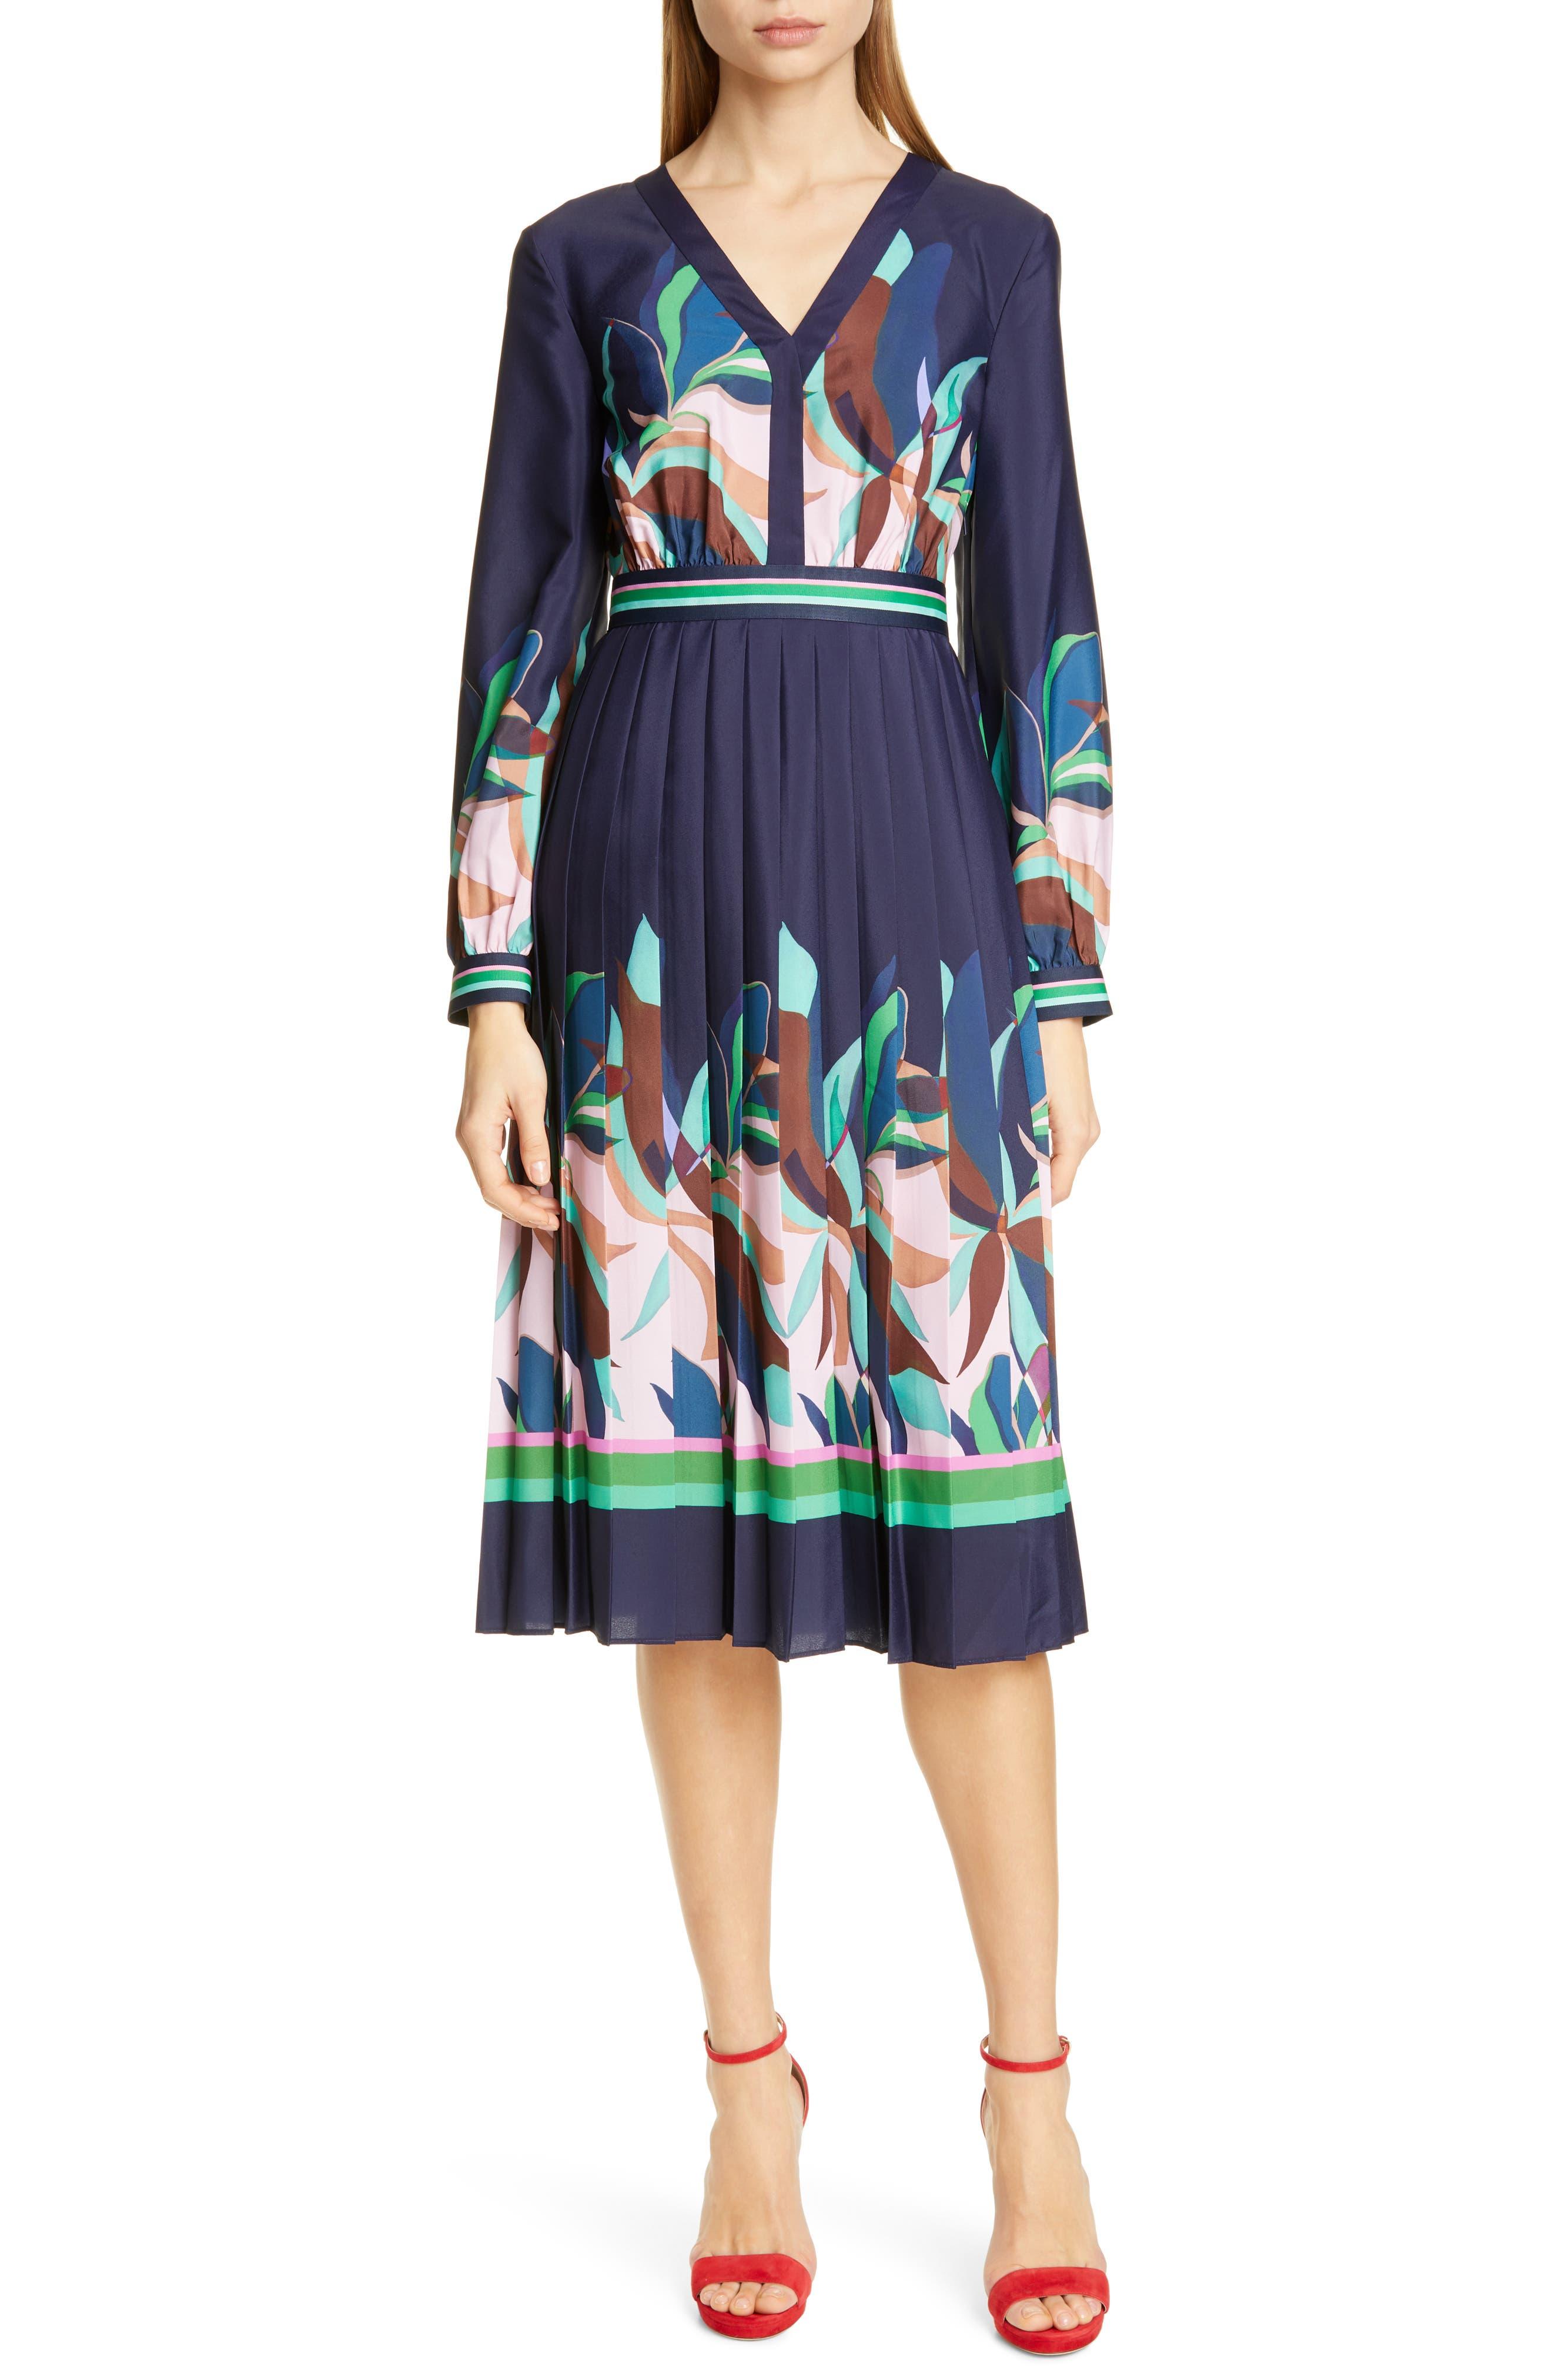 TED BAKER LONDON, Leonore Supernatural Fit & Flare Dress, Main thumbnail 1, color, NAVY